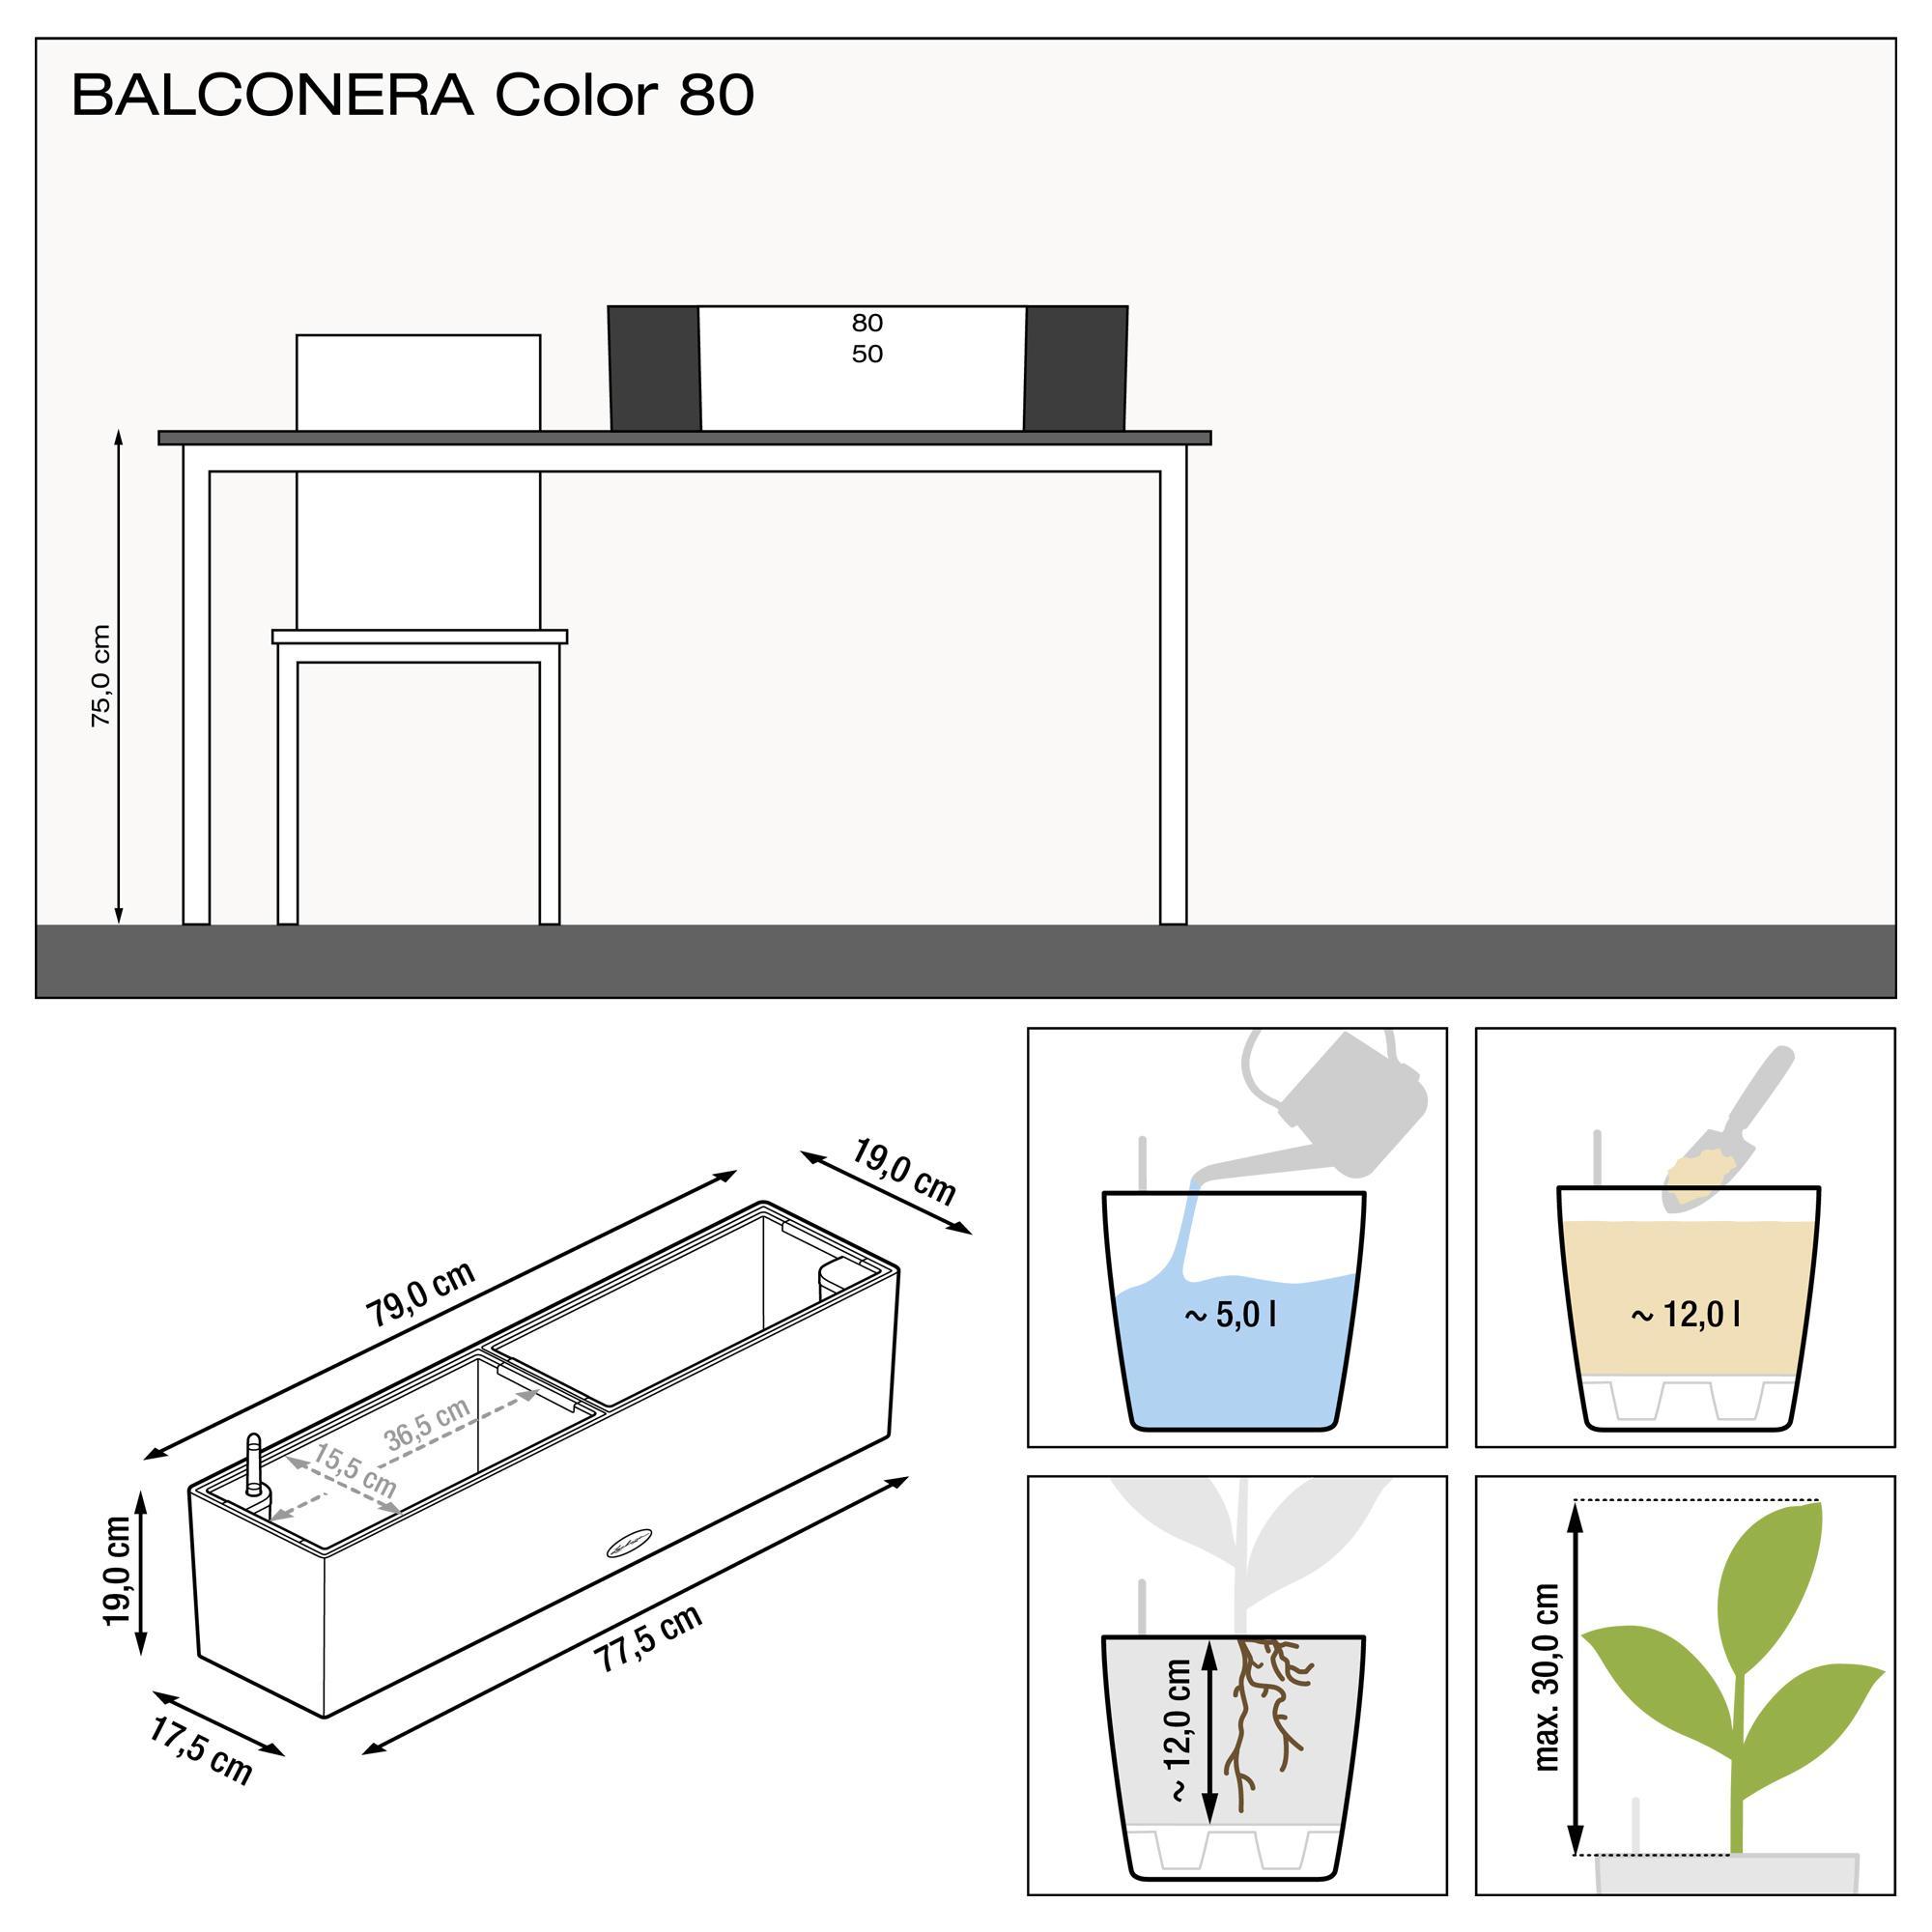 BALCONERA Color 80 purple garnet - Image 3